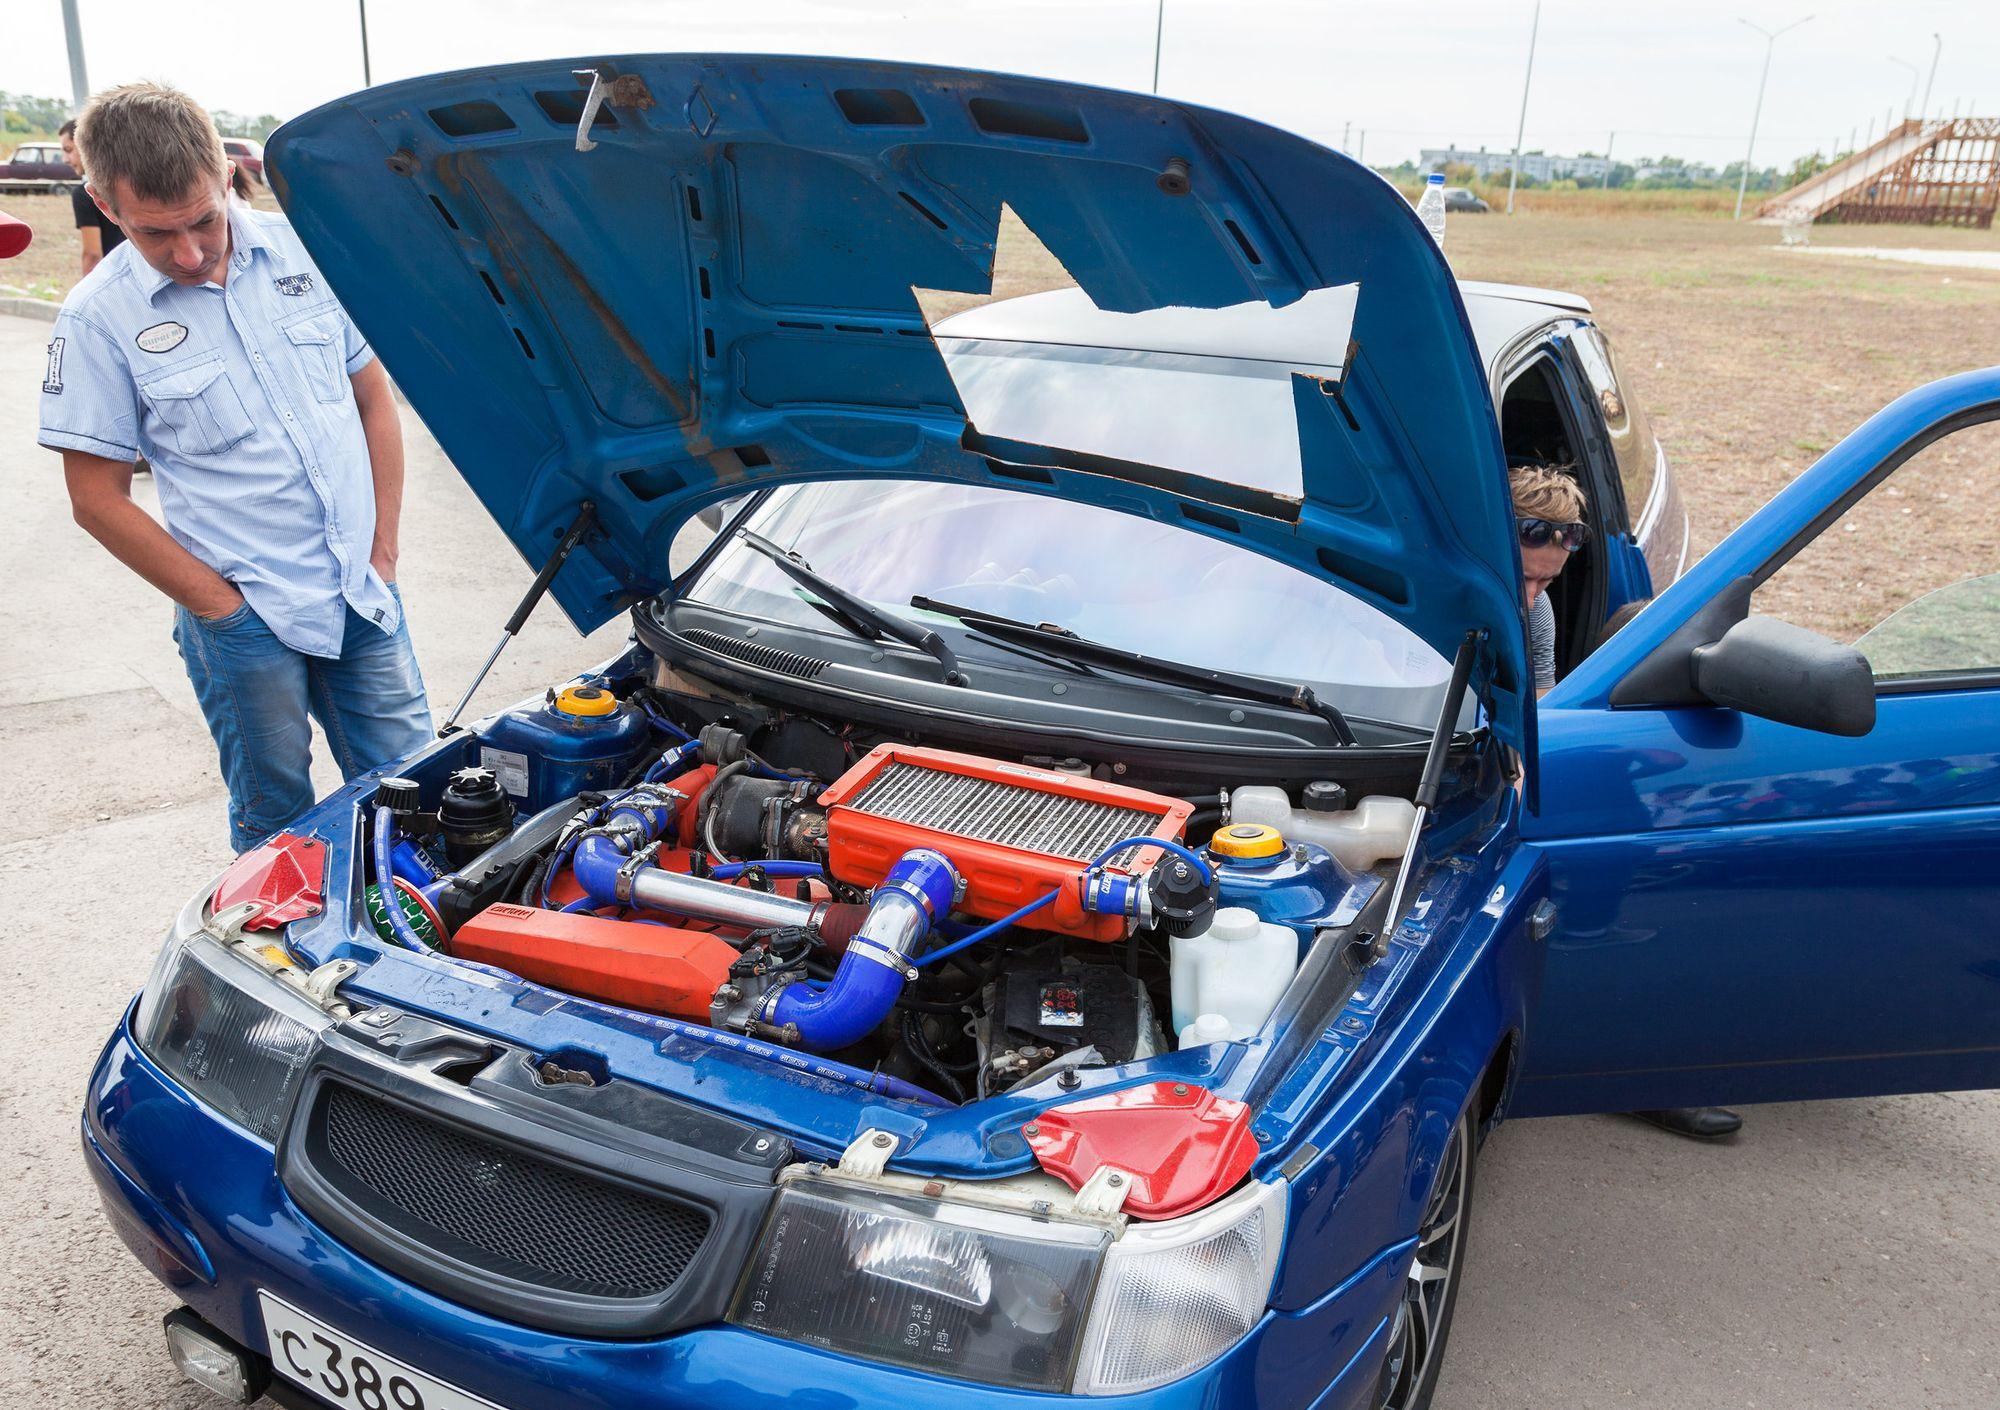 Cobertura de seguro para autos modificados